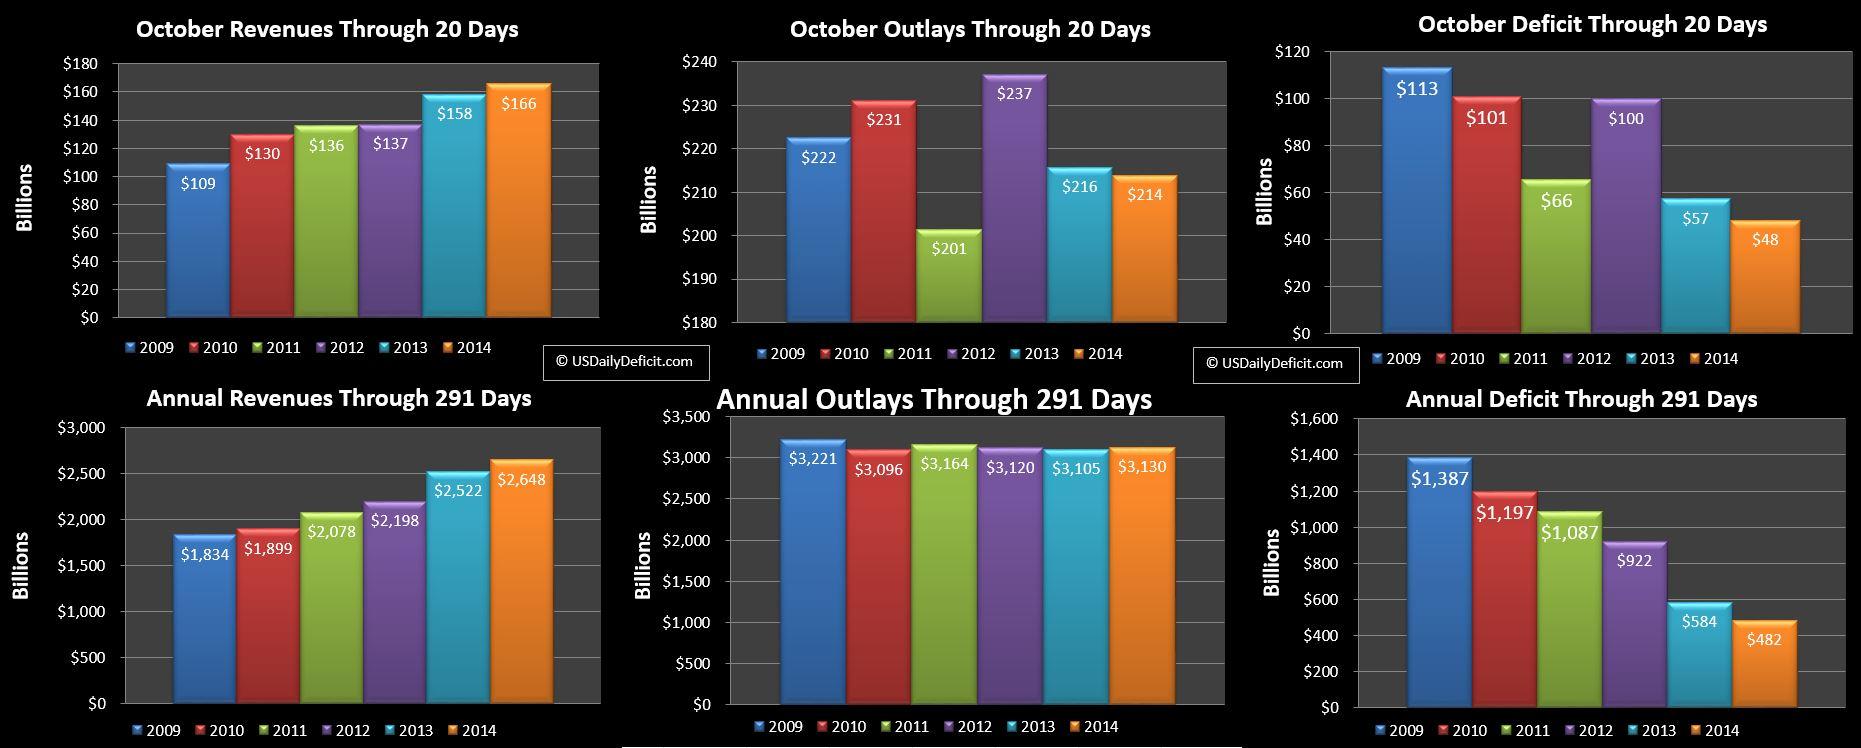 2014-10-20 USDD